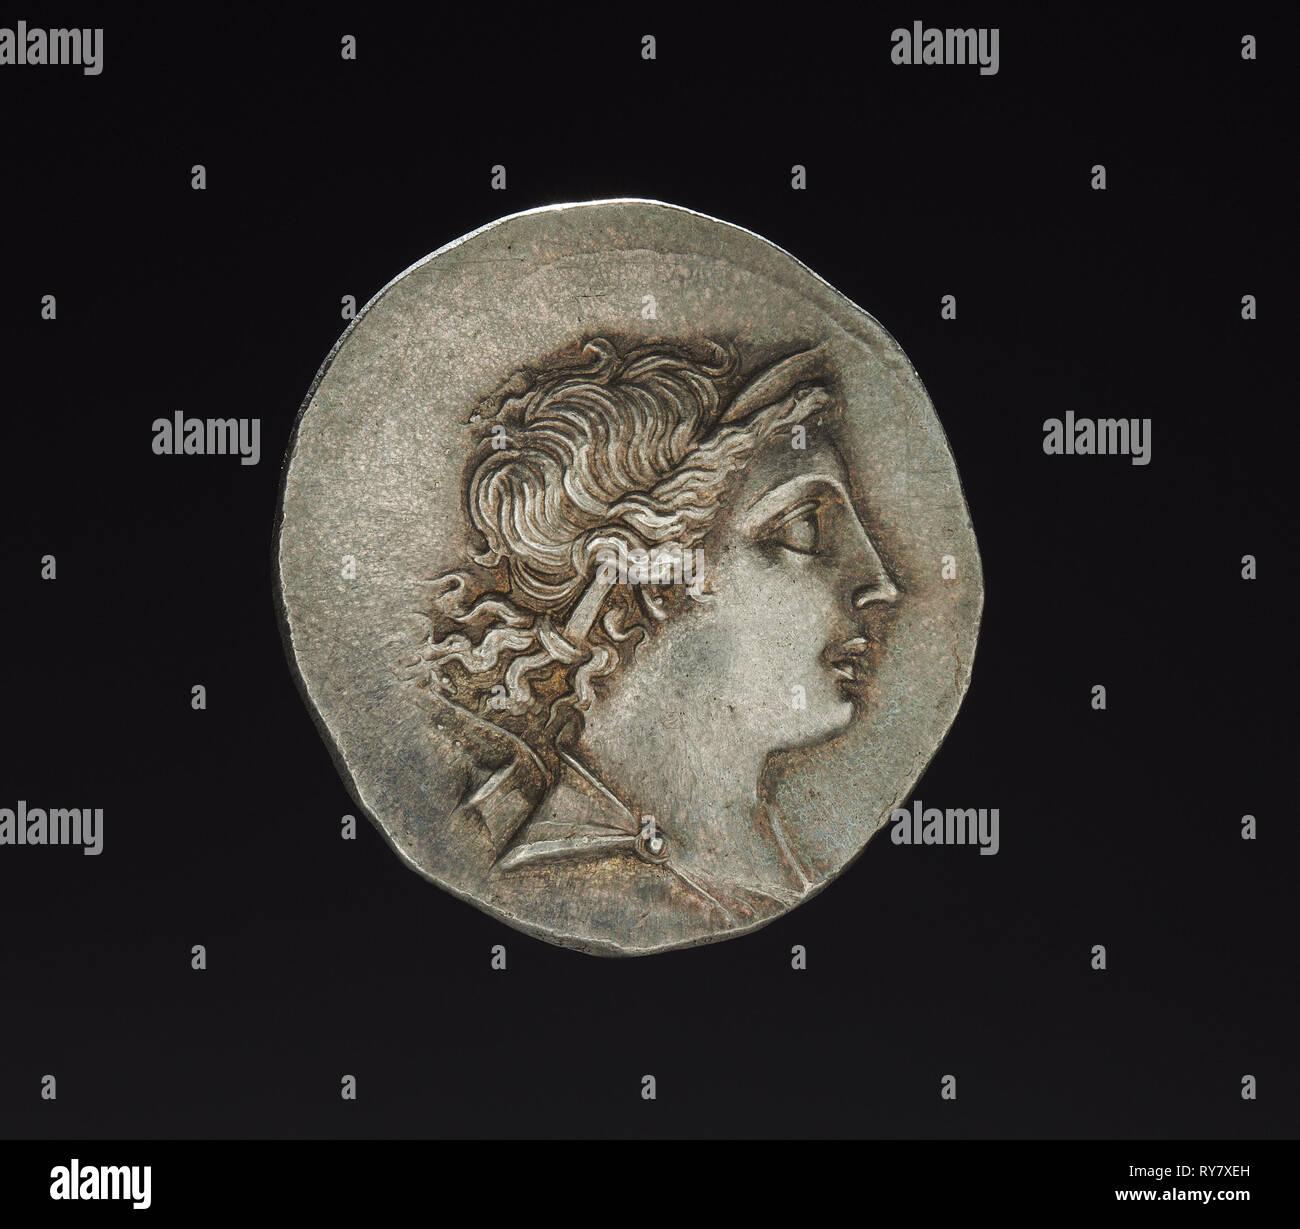 Tetradrachm Coin of Erognetos, Magistrate of Magnesia, 155-145 BC. Turkey, Ionia, Magnesia on the Maeander, Hellenistic Period. Silver; diameter: 3.2 x 0.5 cm (1 1/4 x 3/16 in - Stock Image